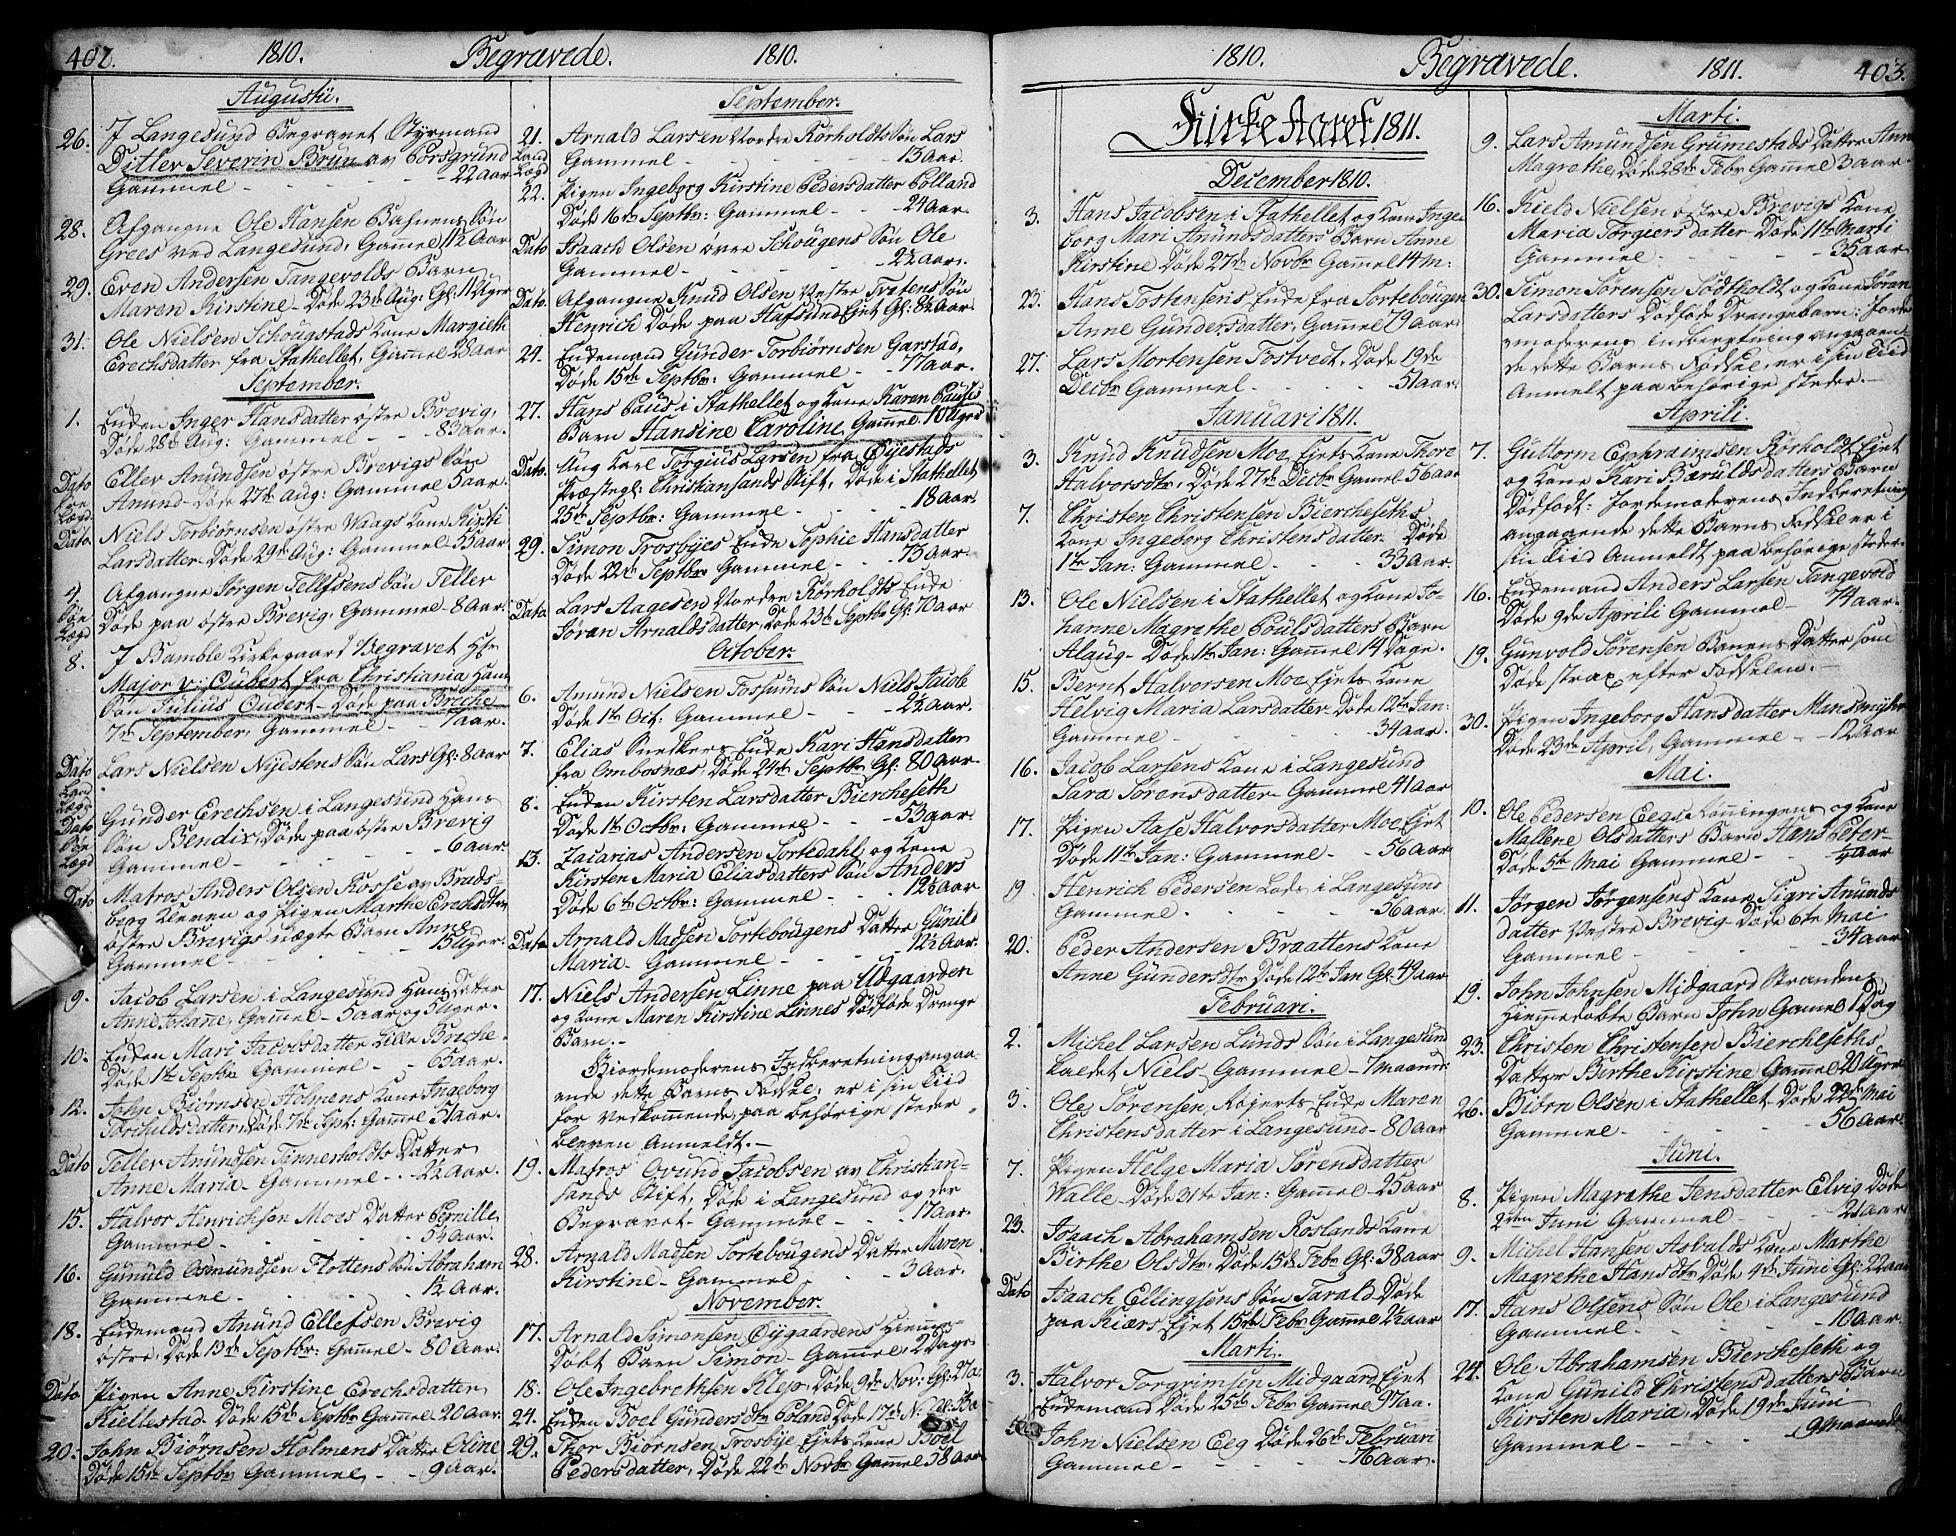 SAKO, Bamble kirkebøker, F/Fa/L0002: Ministerialbok nr. I 2, 1775-1814, s. 402-403